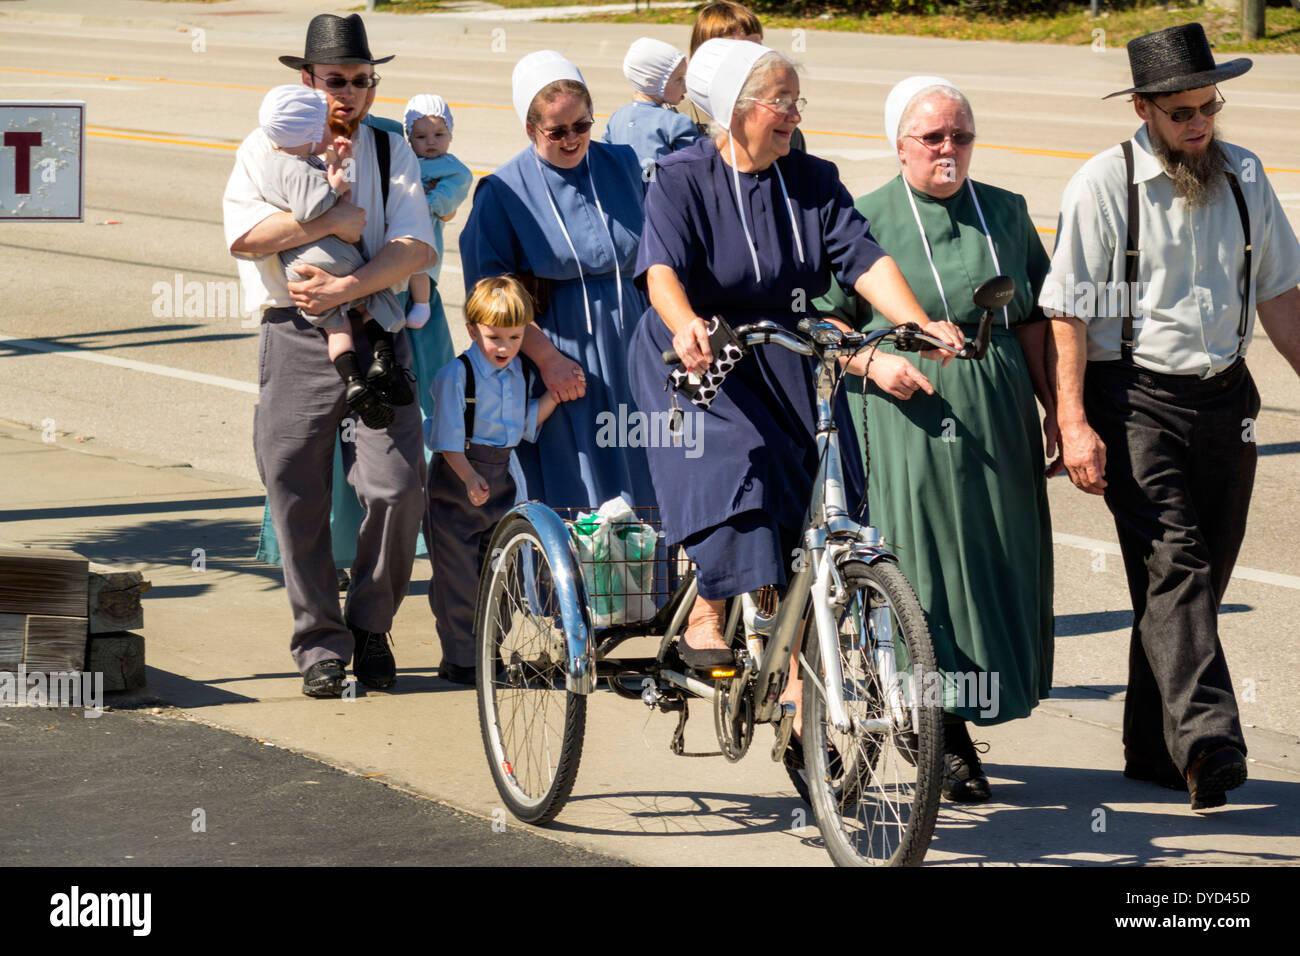 Amish Mennonite datingside Hvorfor er radioaktivt dating feil